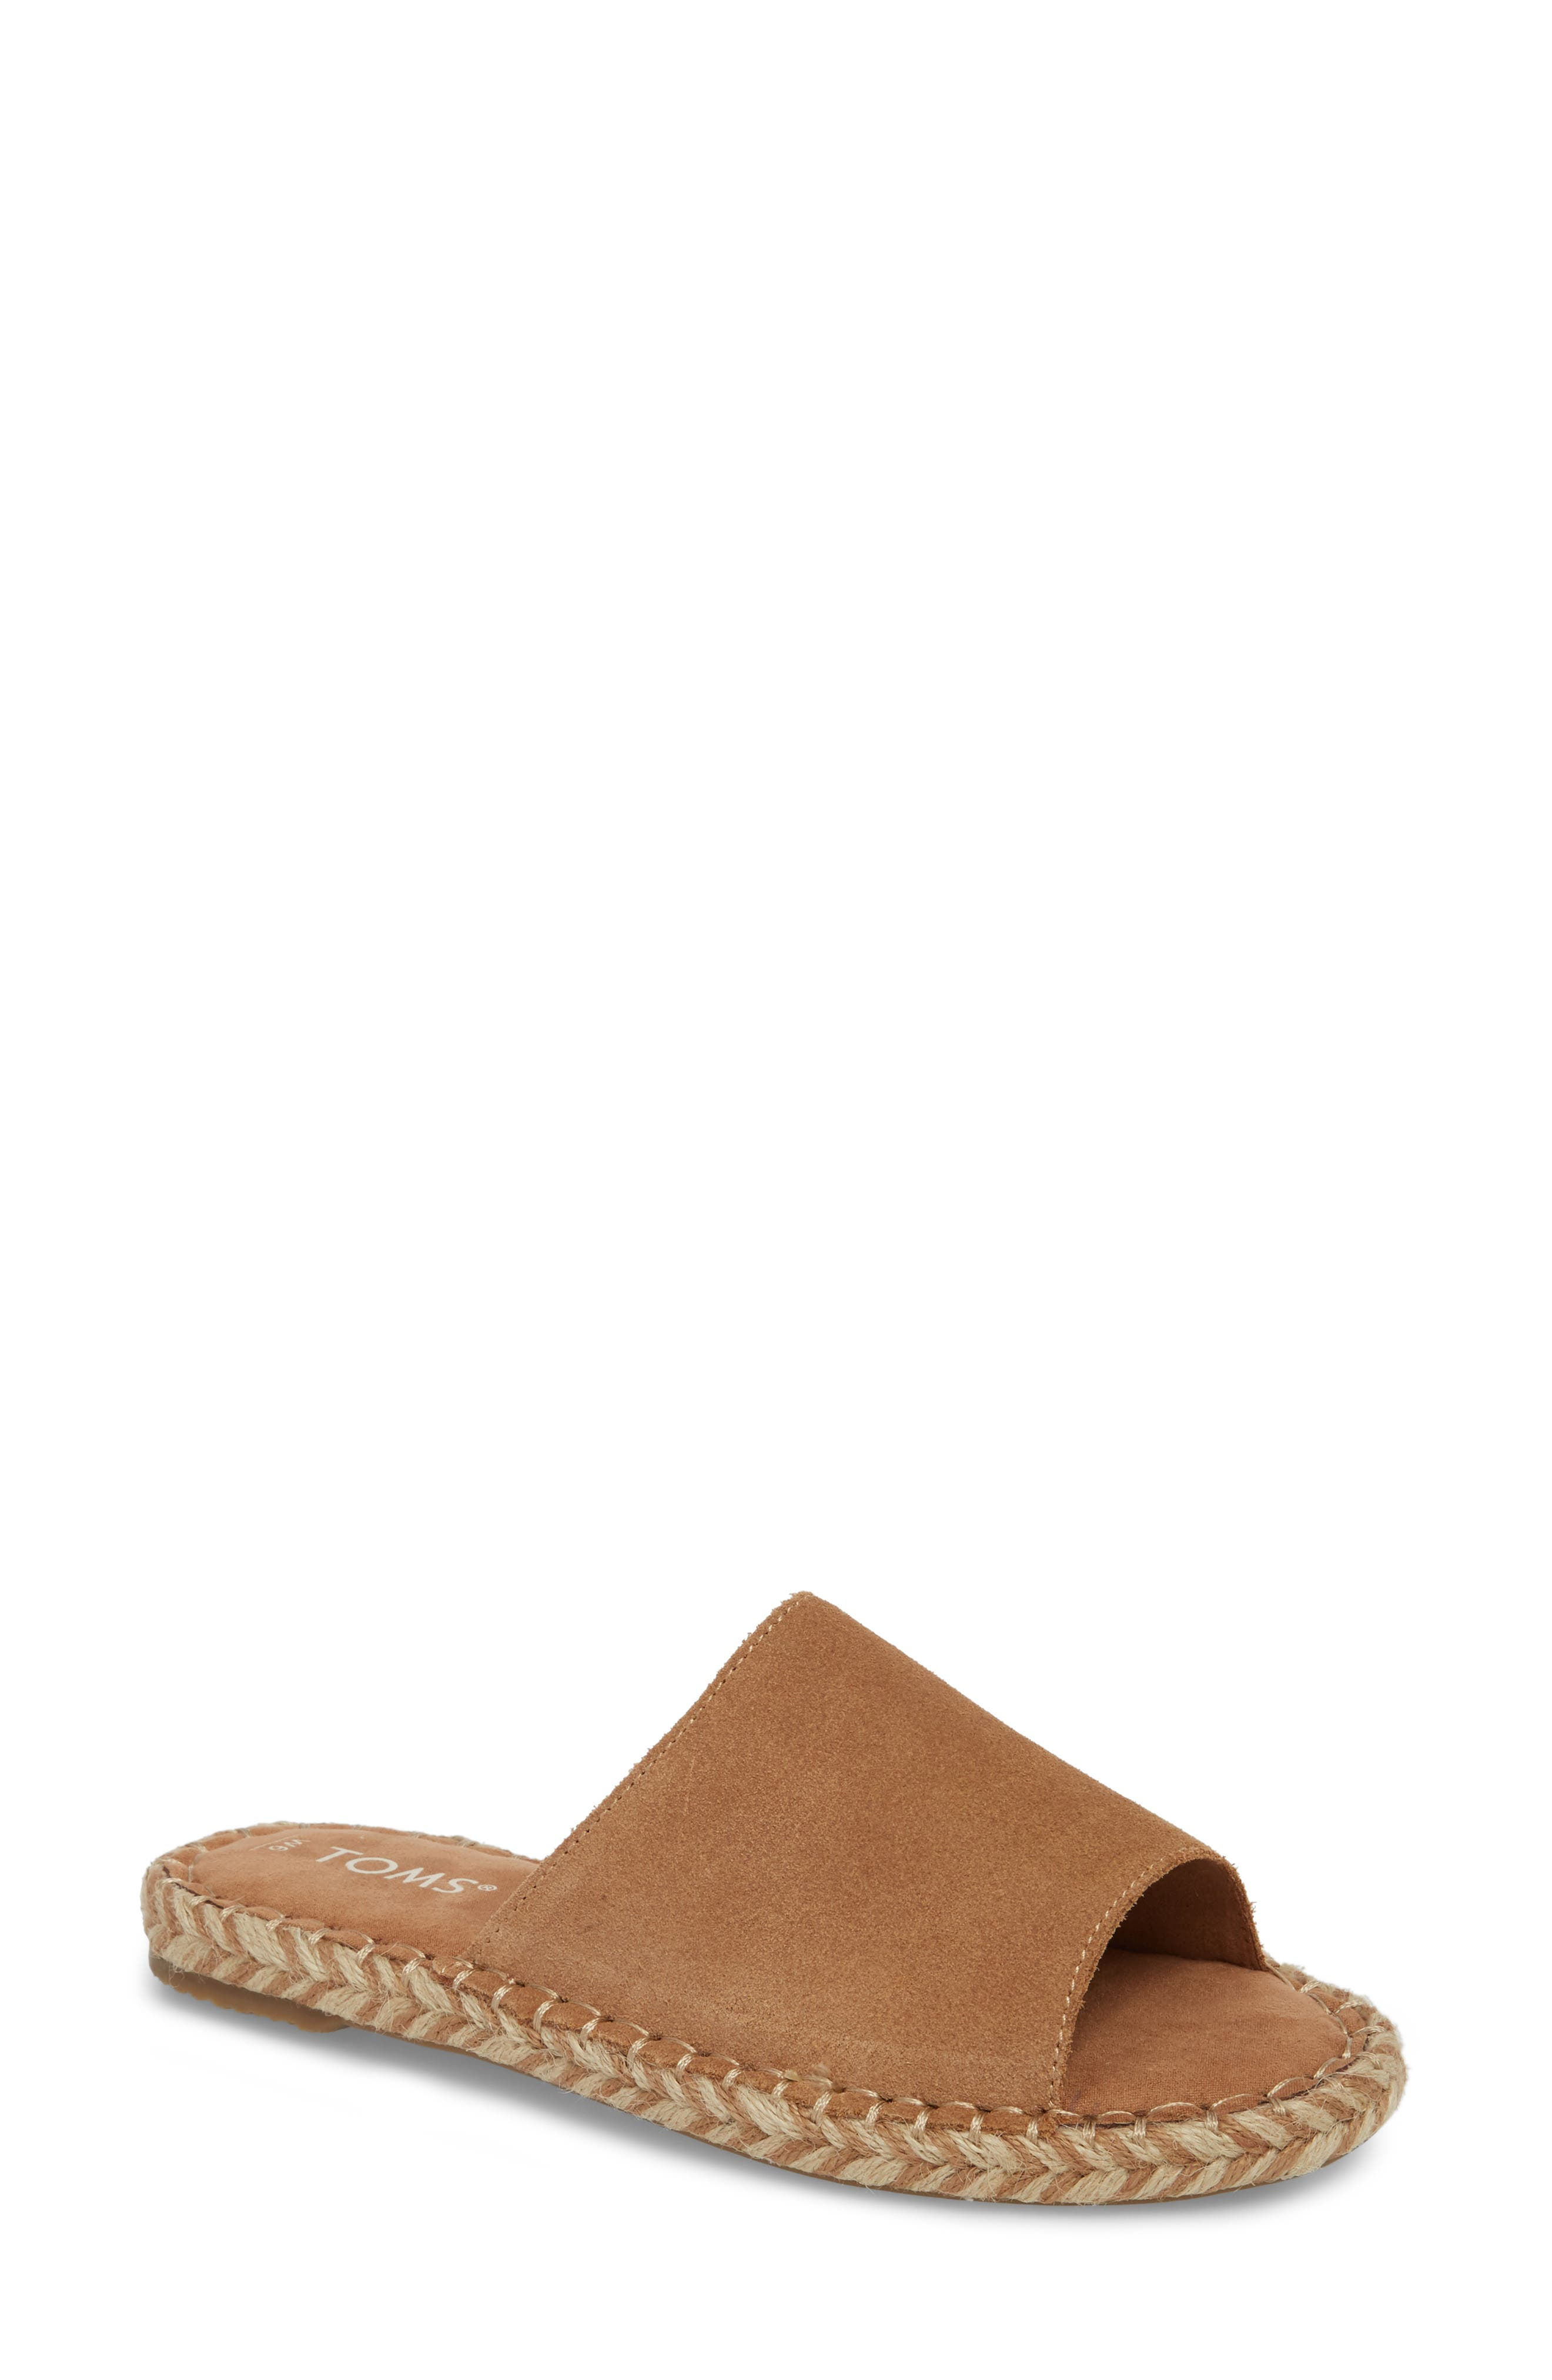 Clarita Espadrille Slide Sandal,                         Main,                         color, Toffee Suede